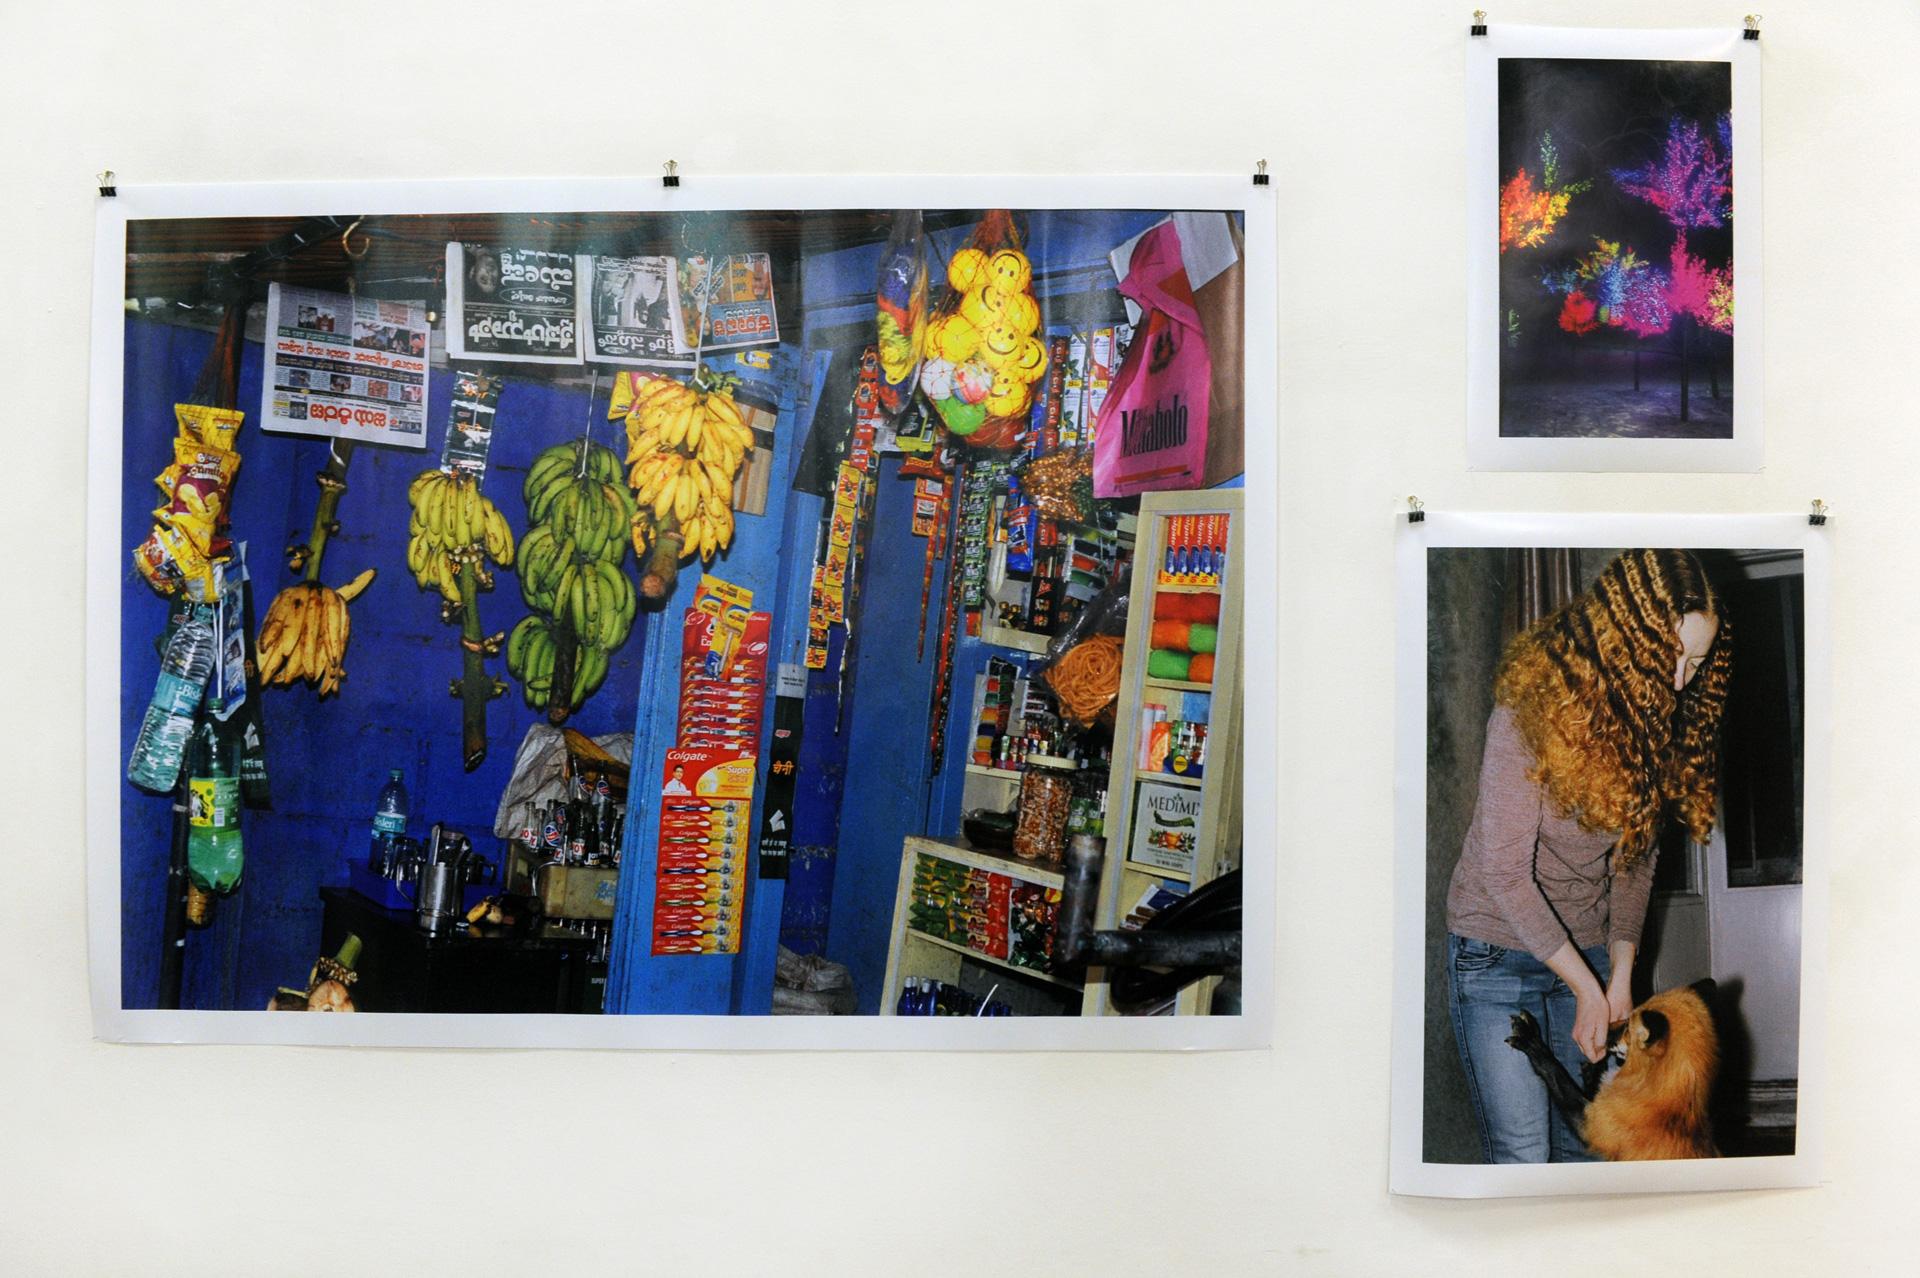 Installation view, Albert Elm